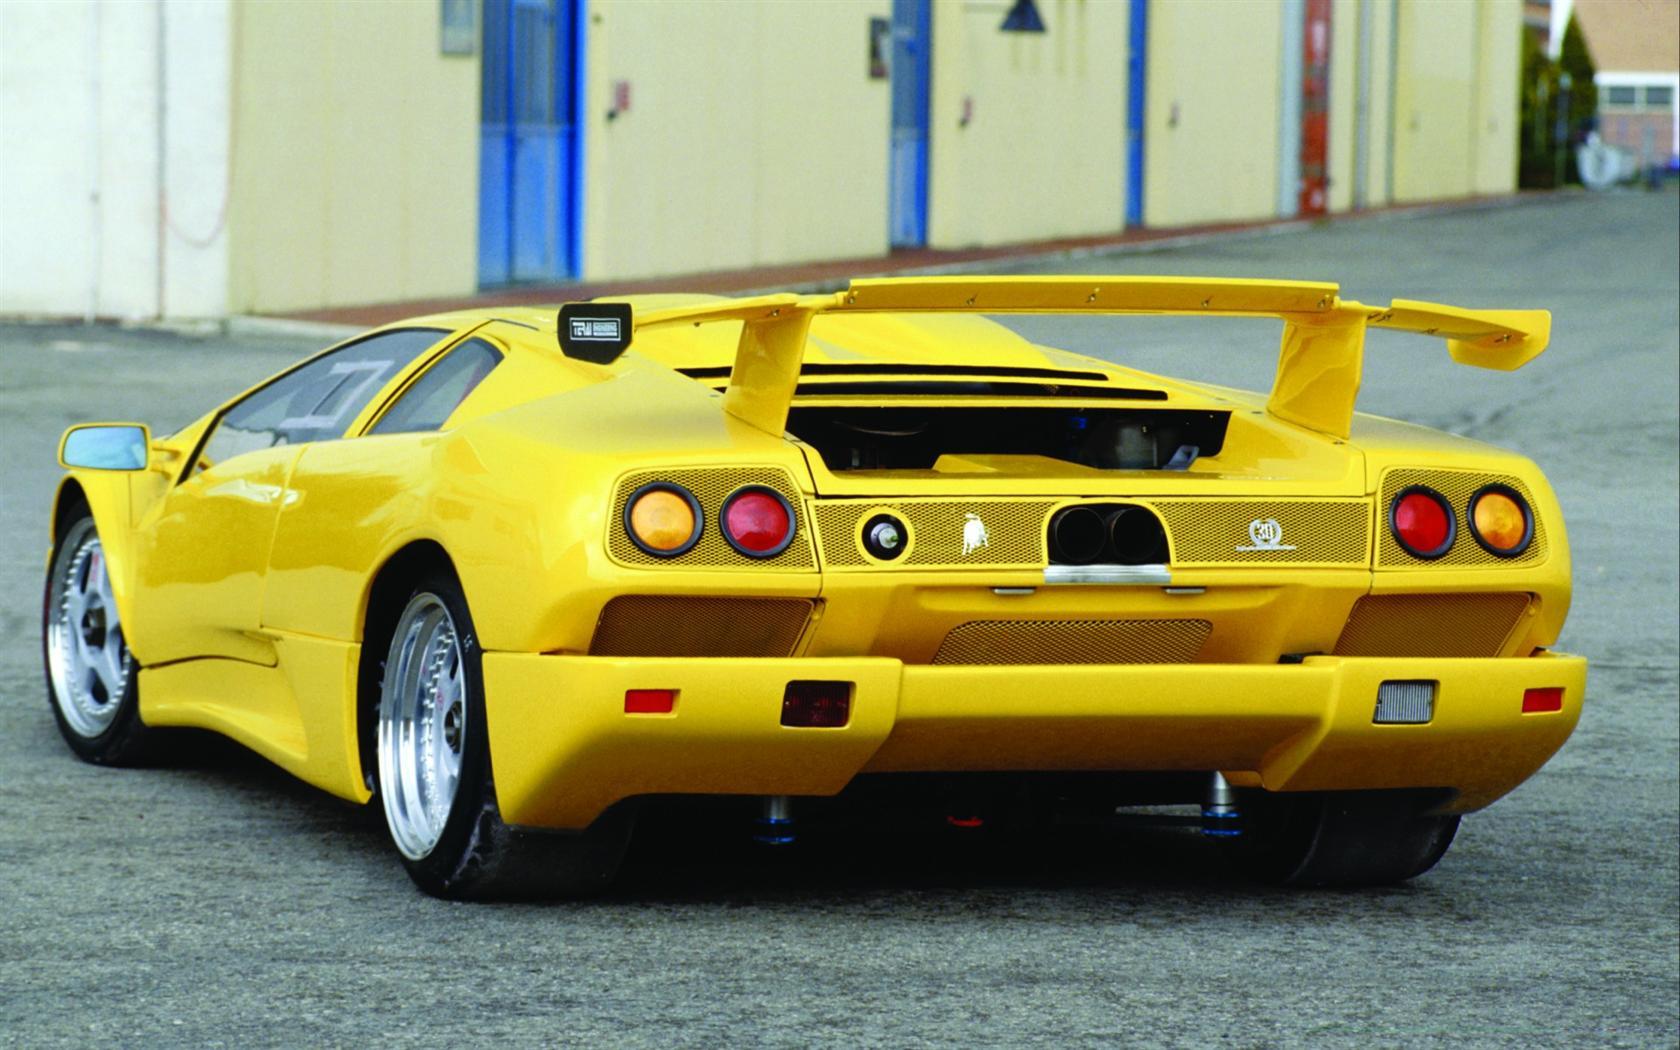 https://www.conceptcarz.com/images/Lamborghini/1995-Lamborghini-Diablo-Iota-Image-04-1680.jpg